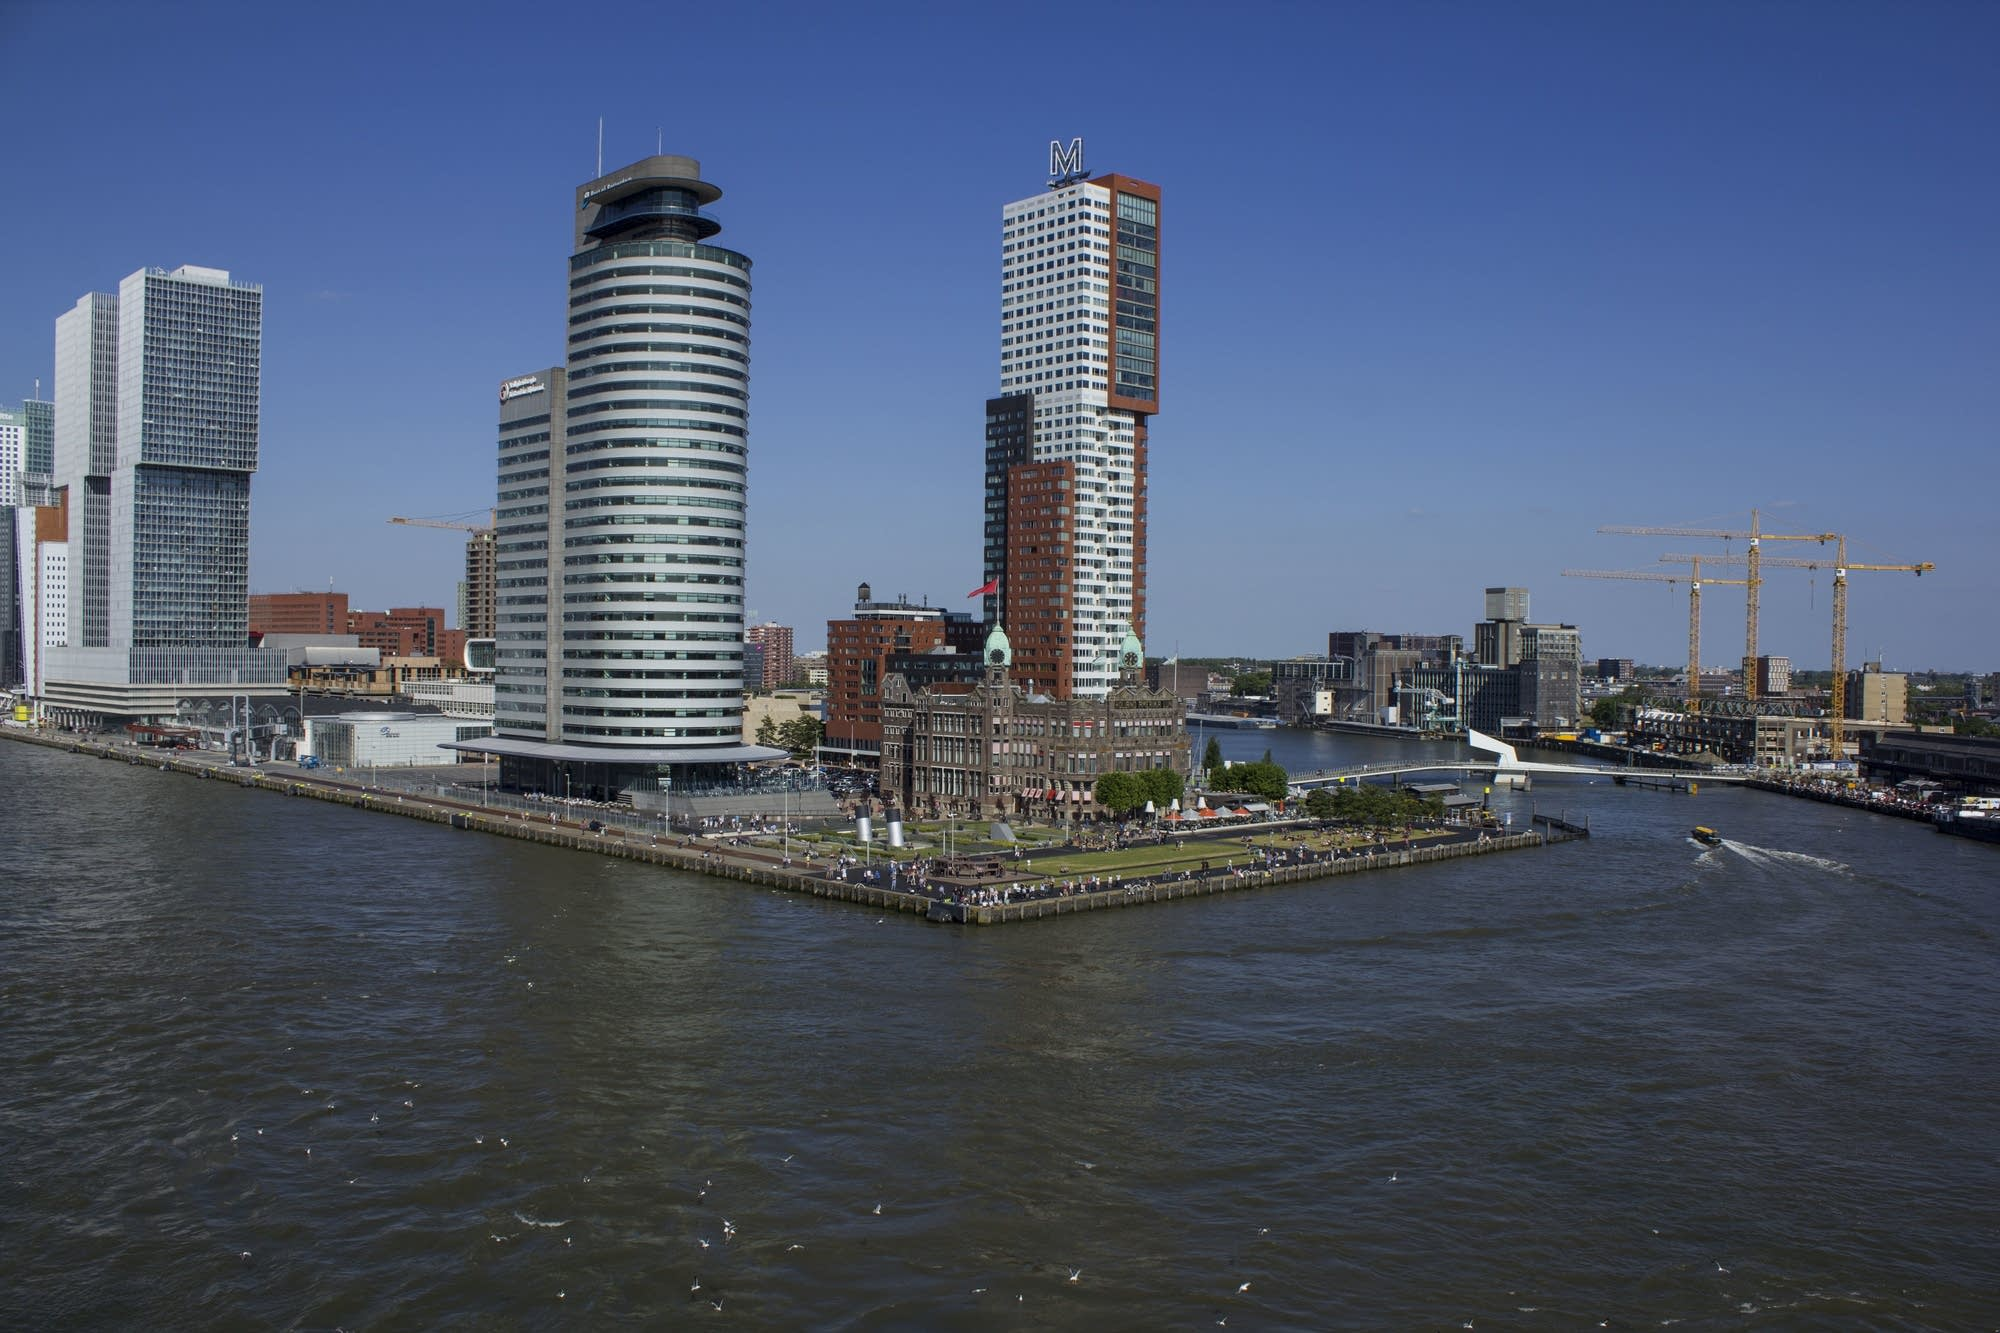 Leaving Rotterdam - city